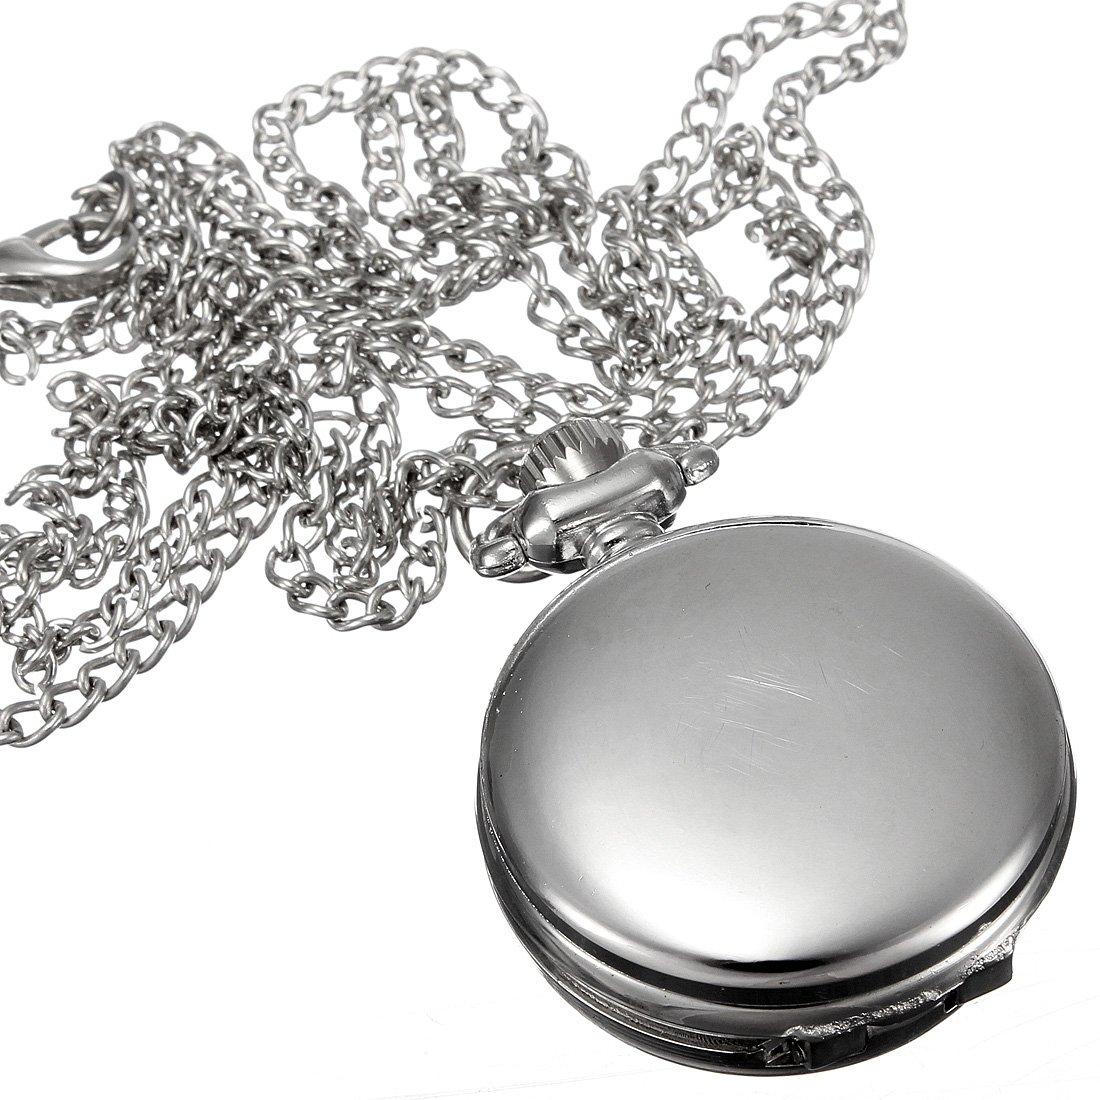 Vintage Birdcage Rose Necklace Quartz Pocket Watch